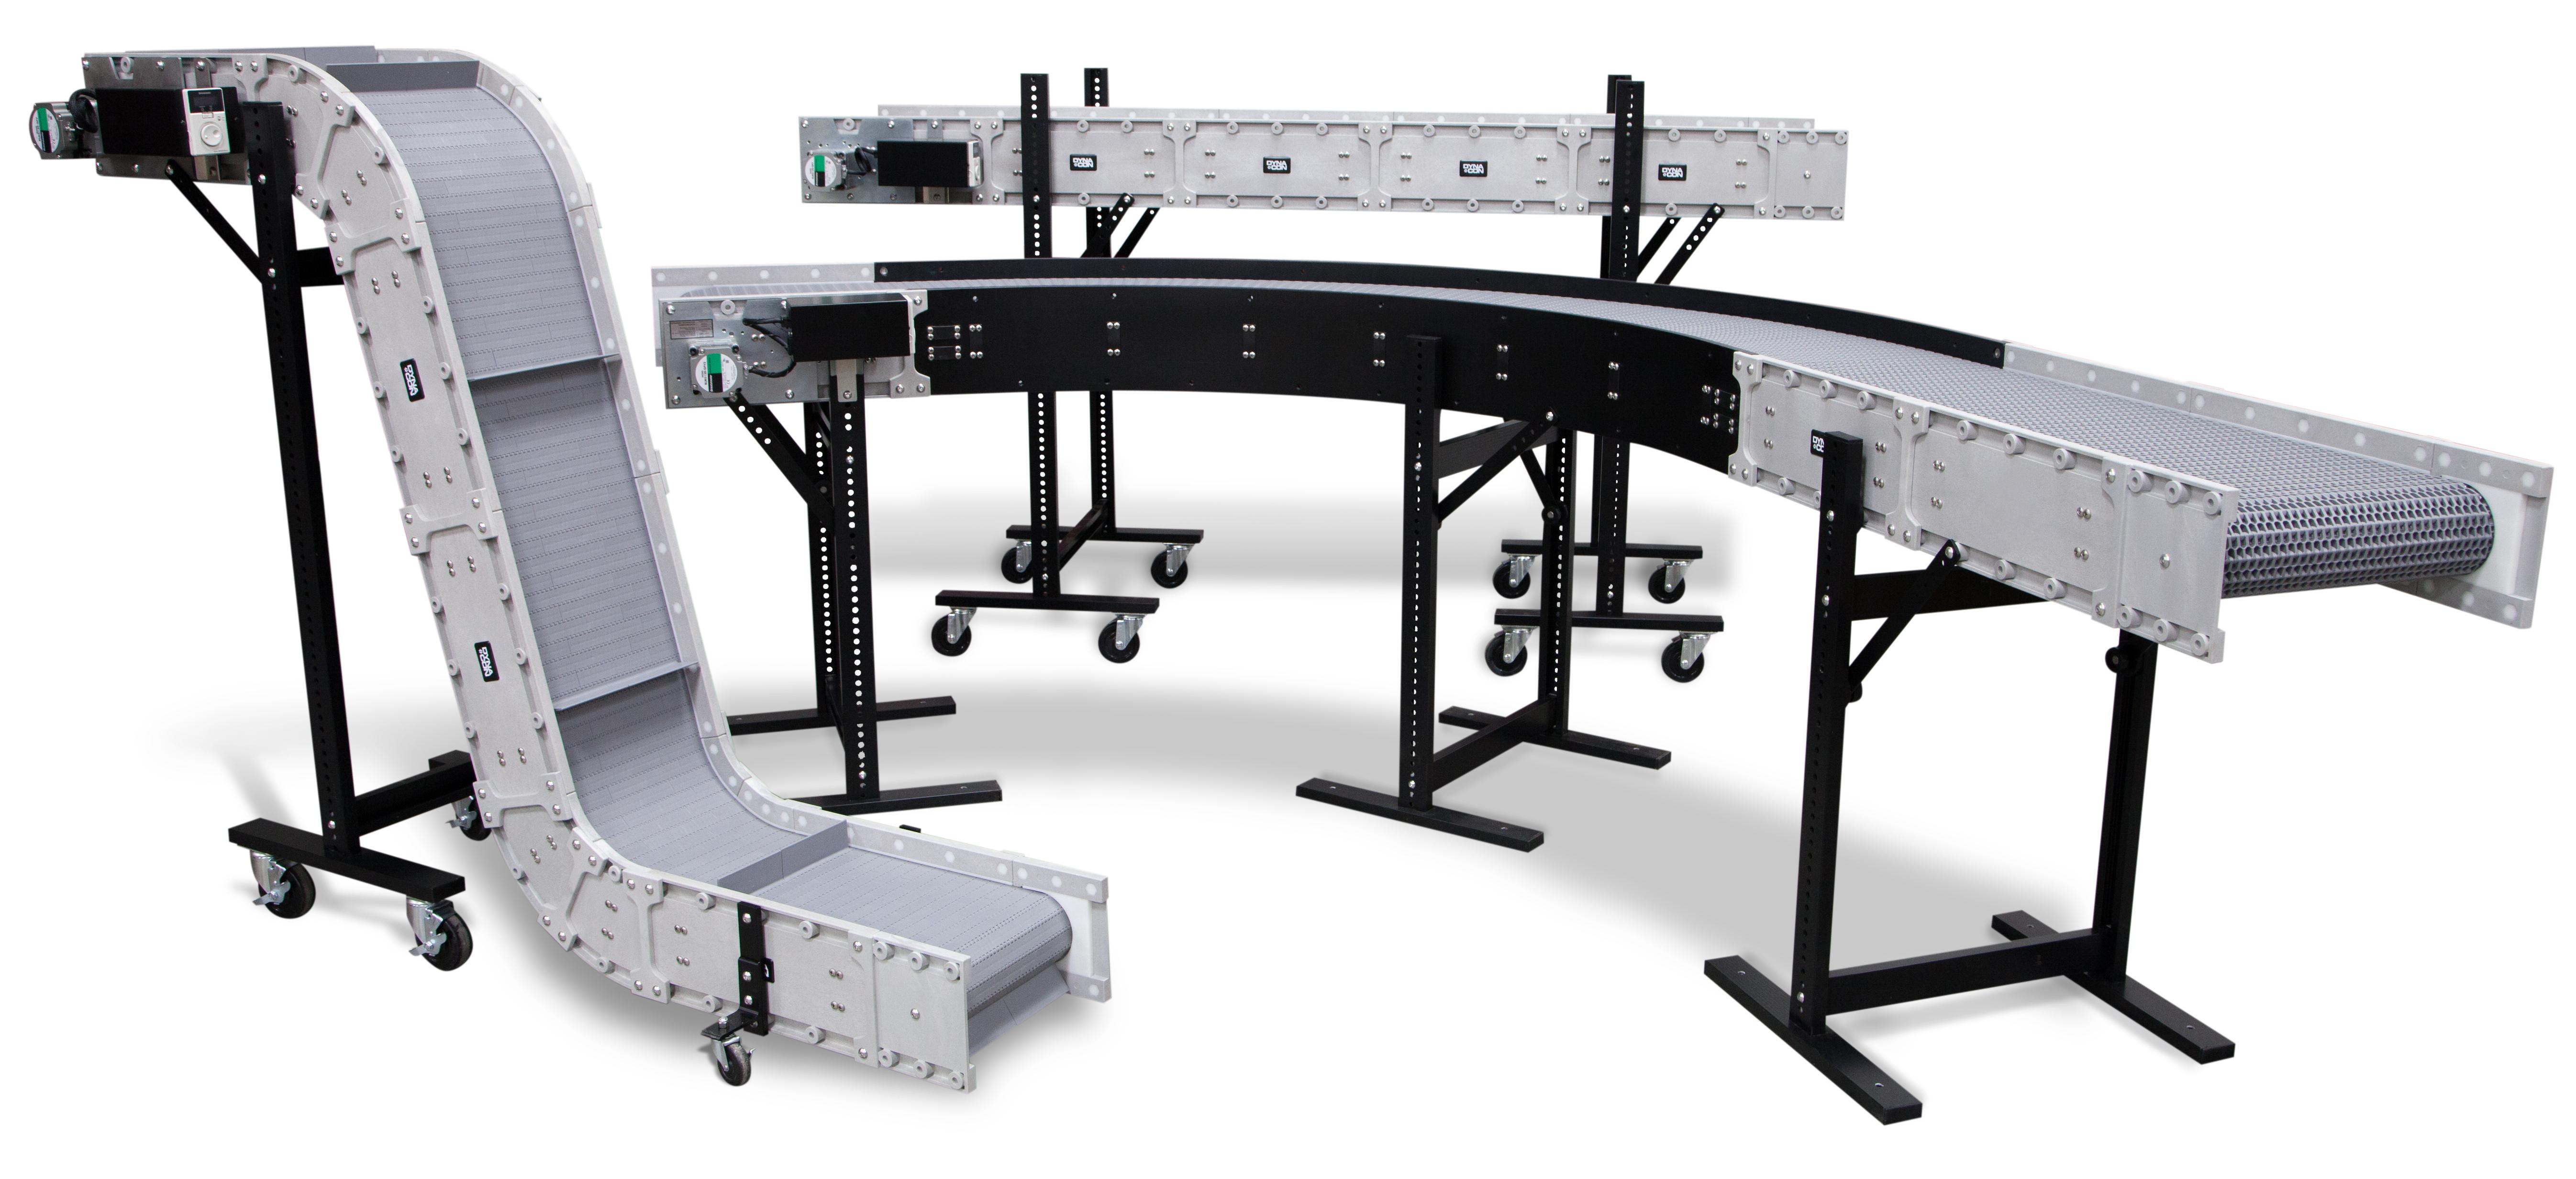 Benefits | DynaCon Modular Belt Conveyors | Clean Room